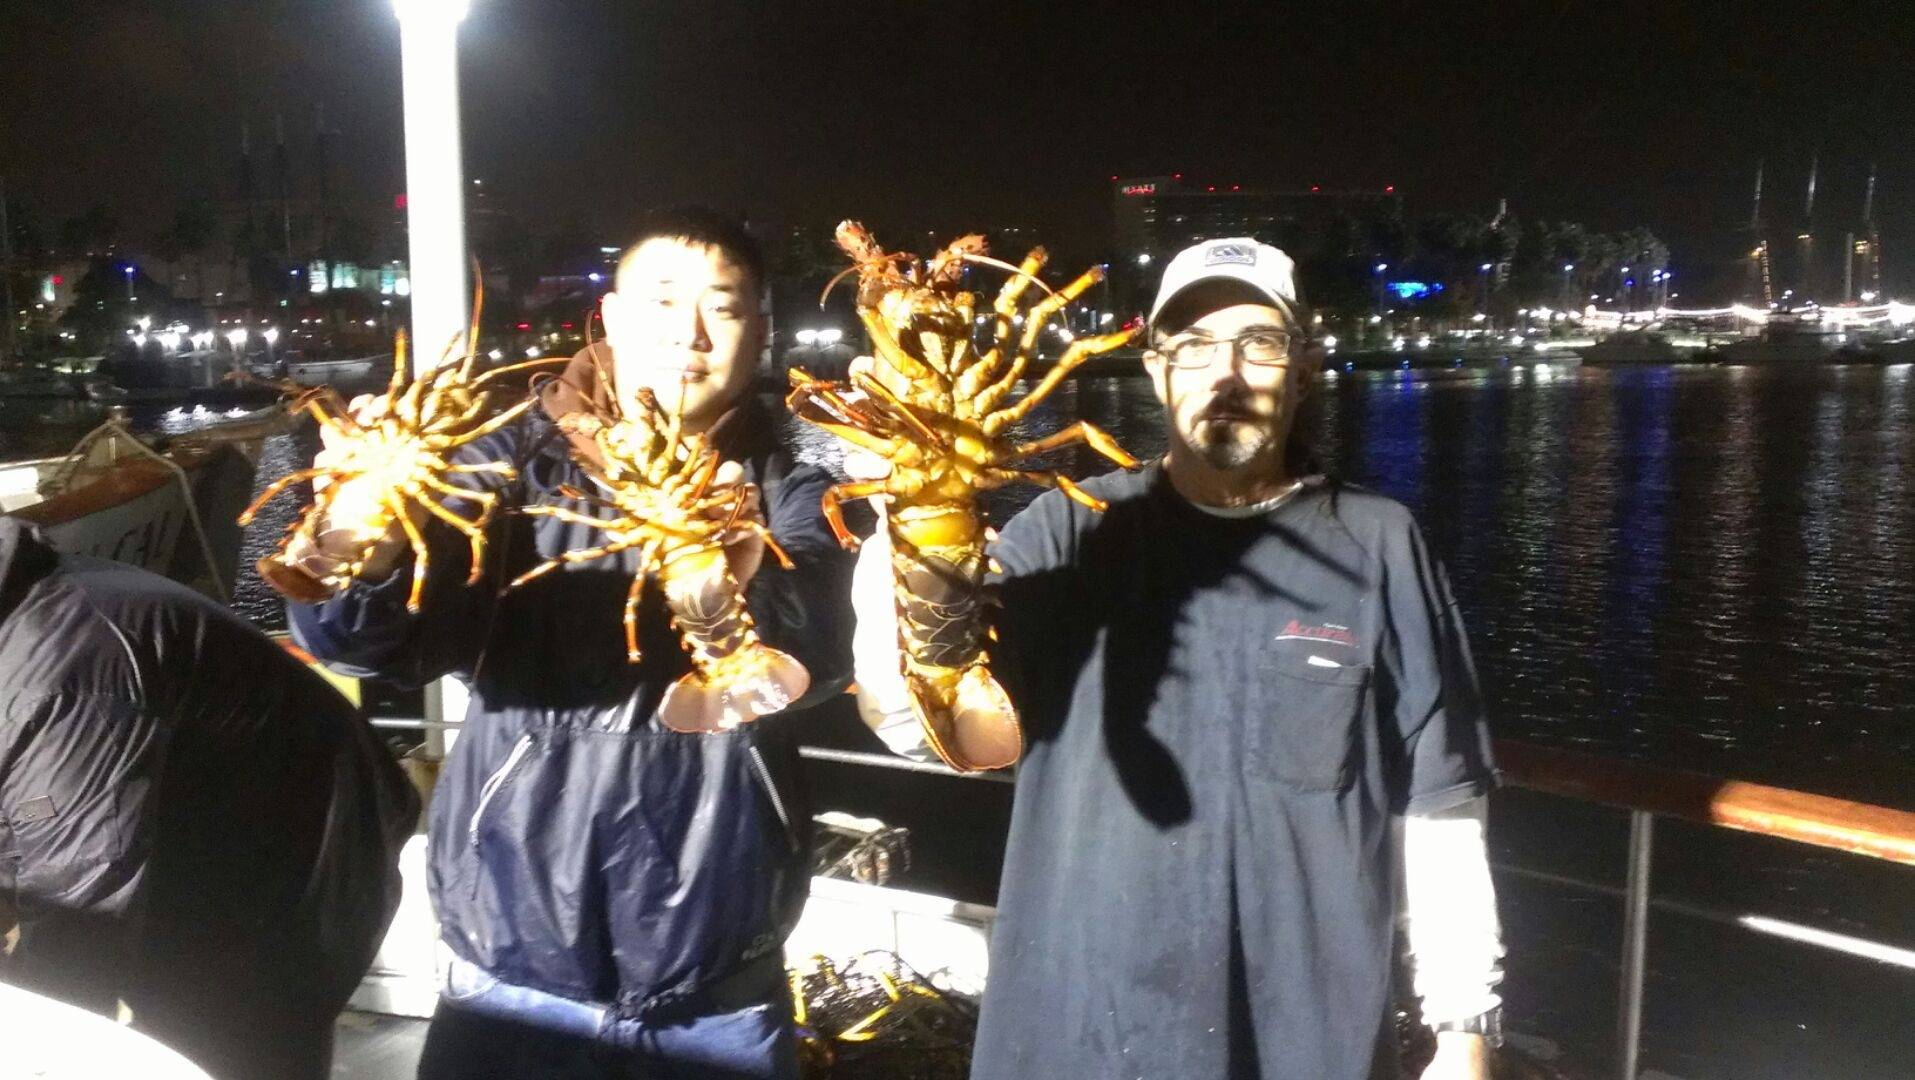 Gail Force 10.6lb Lobster | Bloodydecks